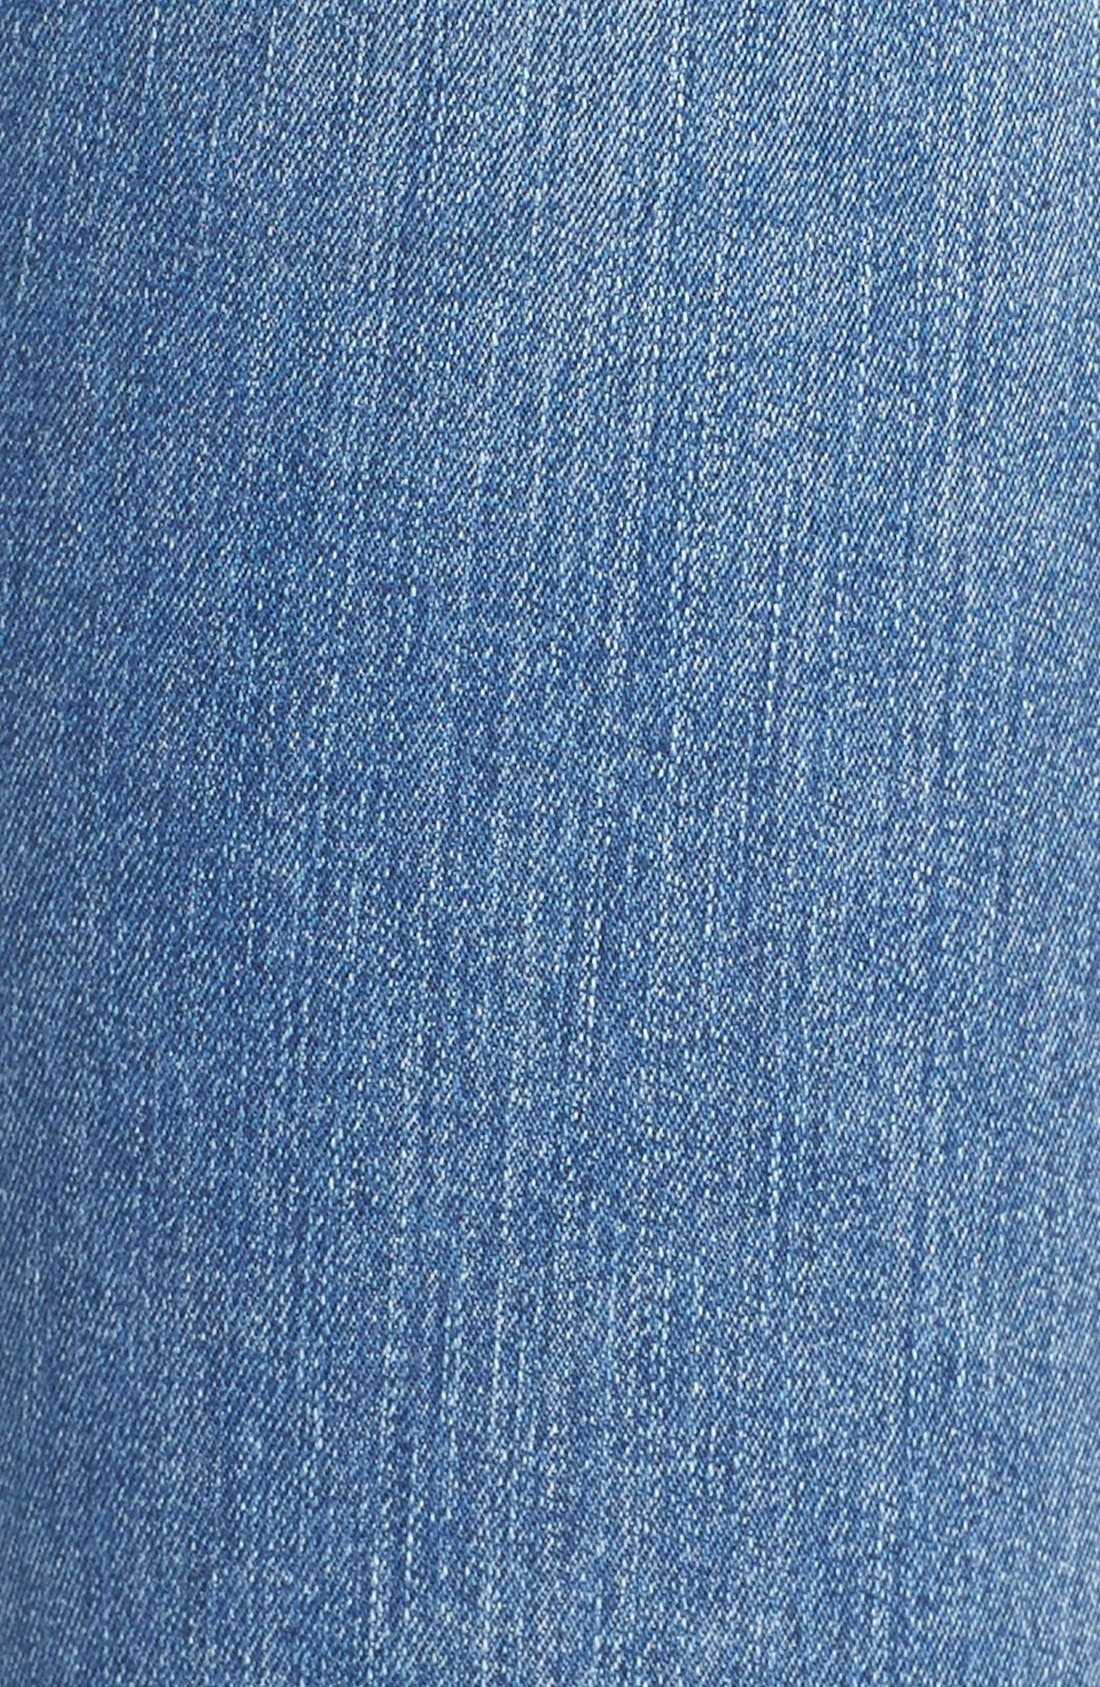 Alternate Image 5  - James Jeans Double Front Zip Denim Leggings (Splash)